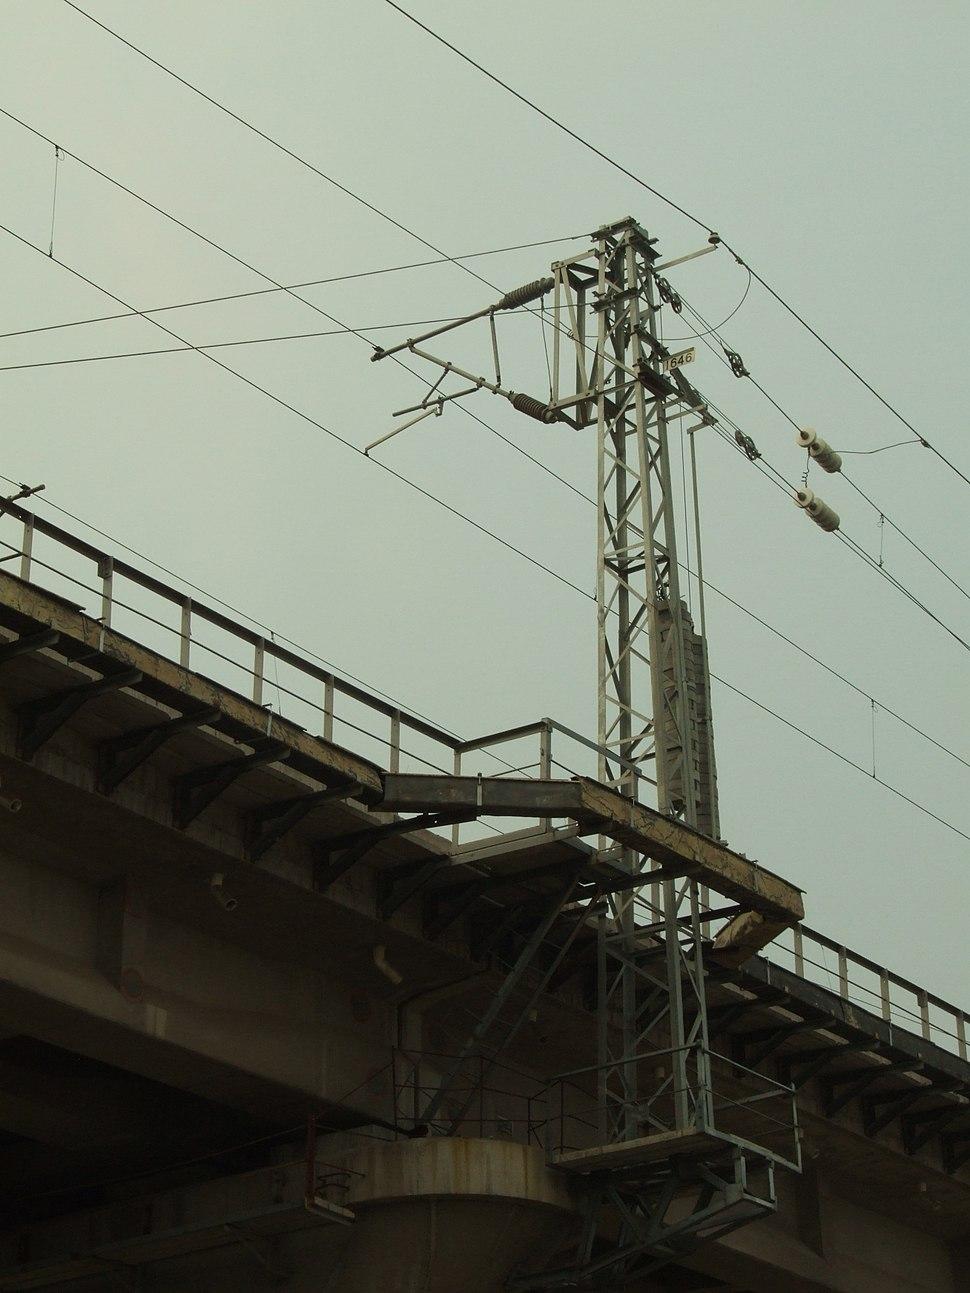 Overhead-lines-railway